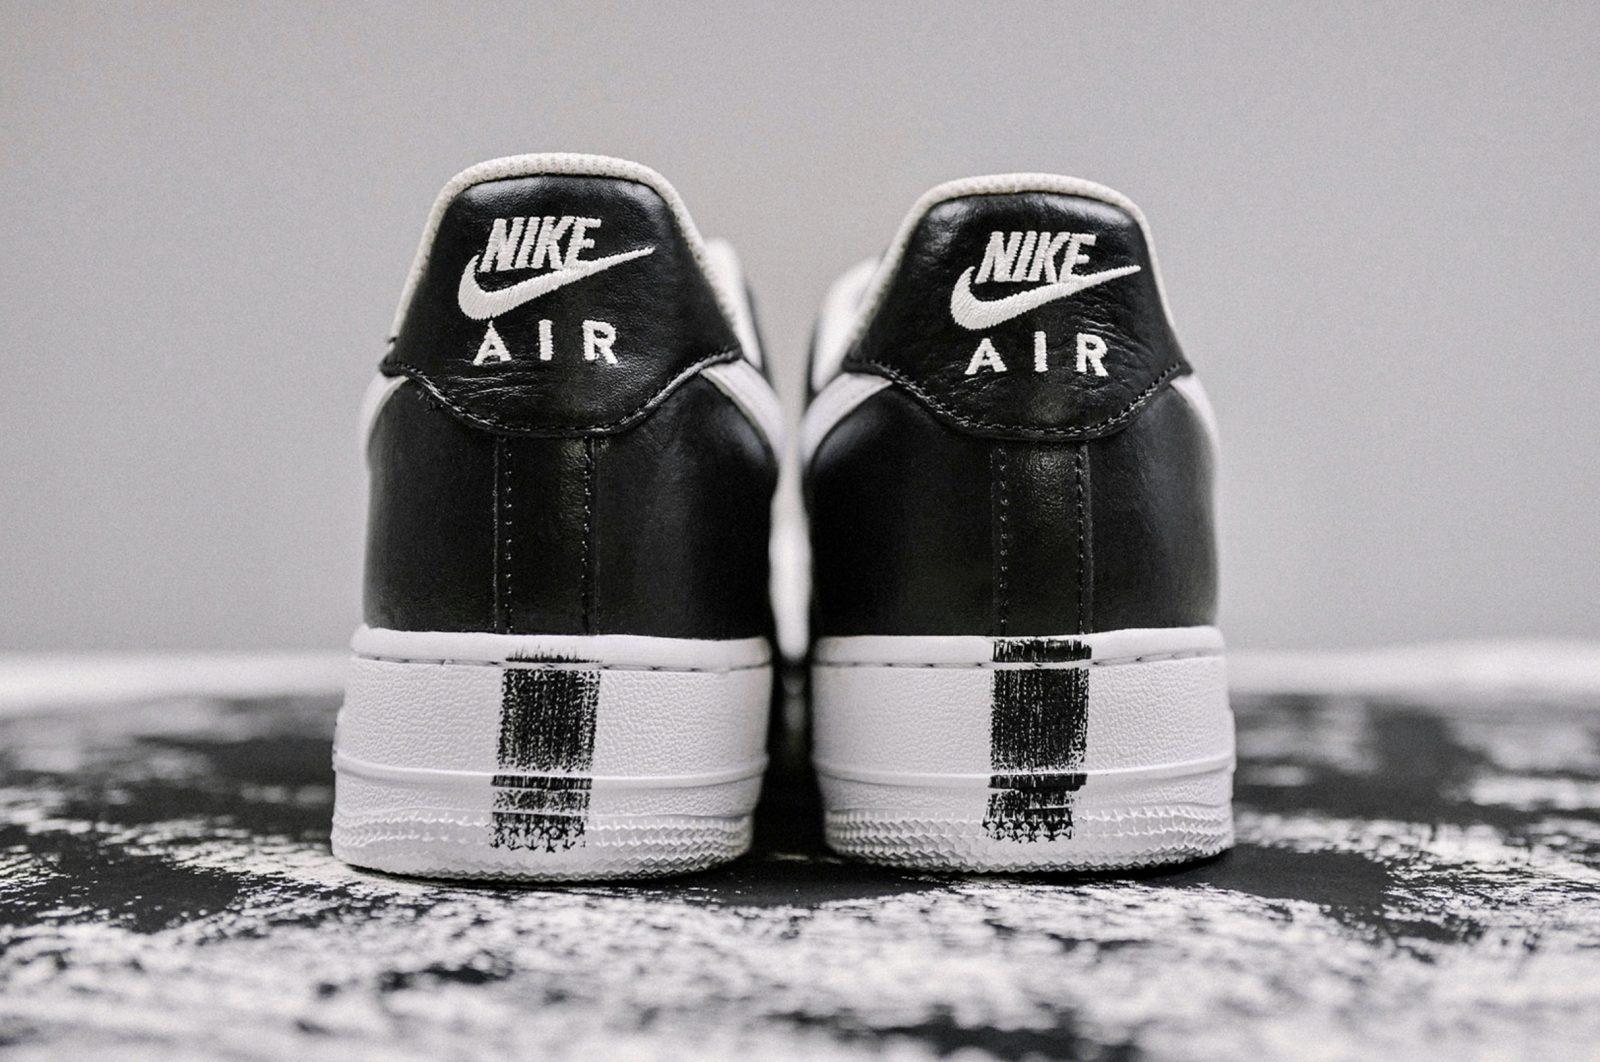 The PEACEMINUSONE x Nike Air Force 1 '07 Will Be Arriving This Week 8 heel